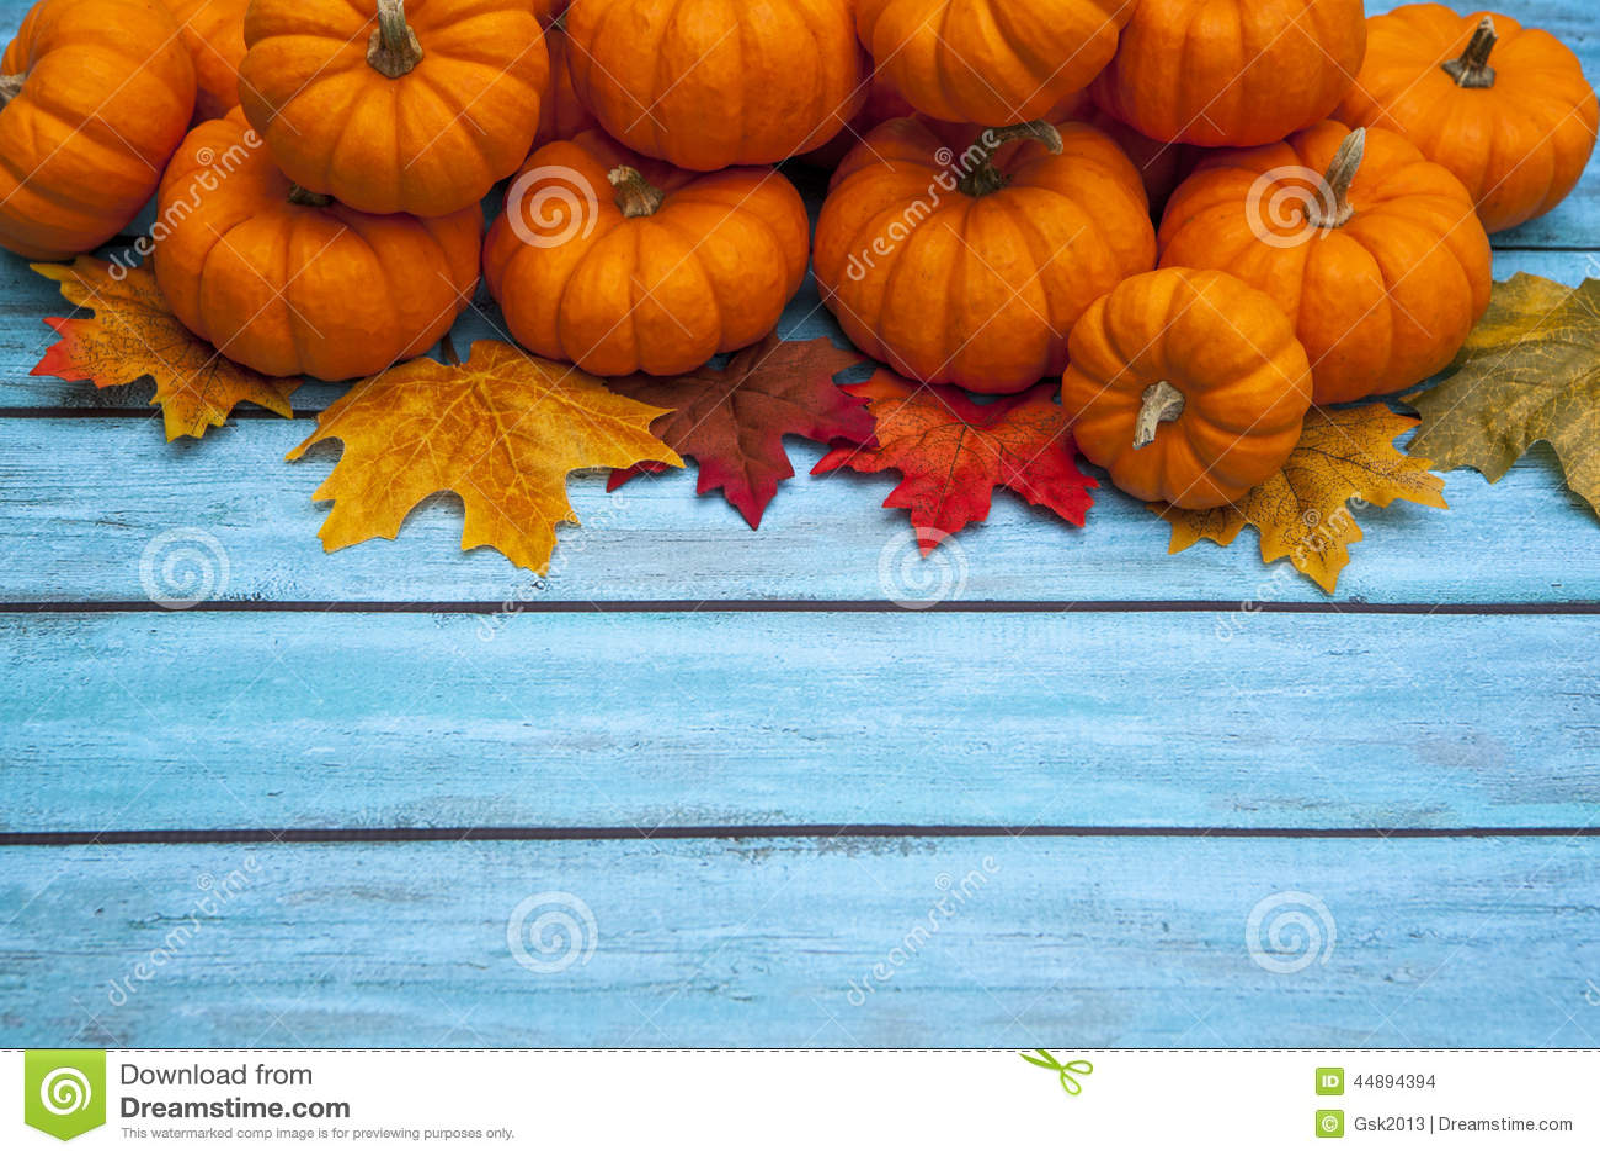 autumn pumpkin thanksgiving background stock photo image of